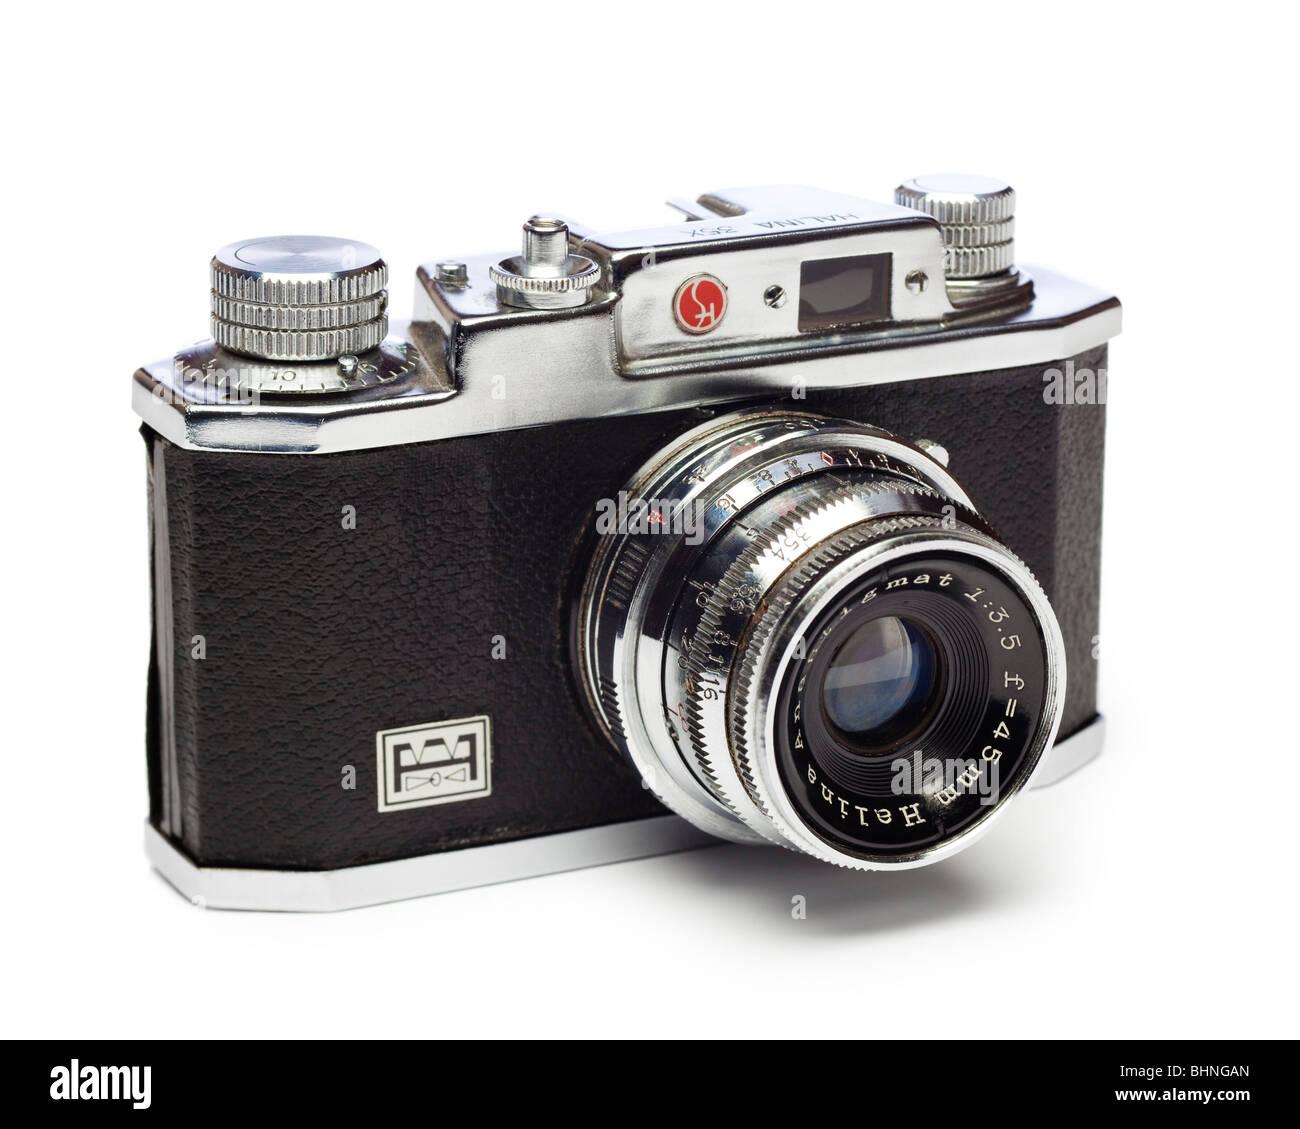 Old camera - Halina 35x rangefinder film camera Stock Photo ...